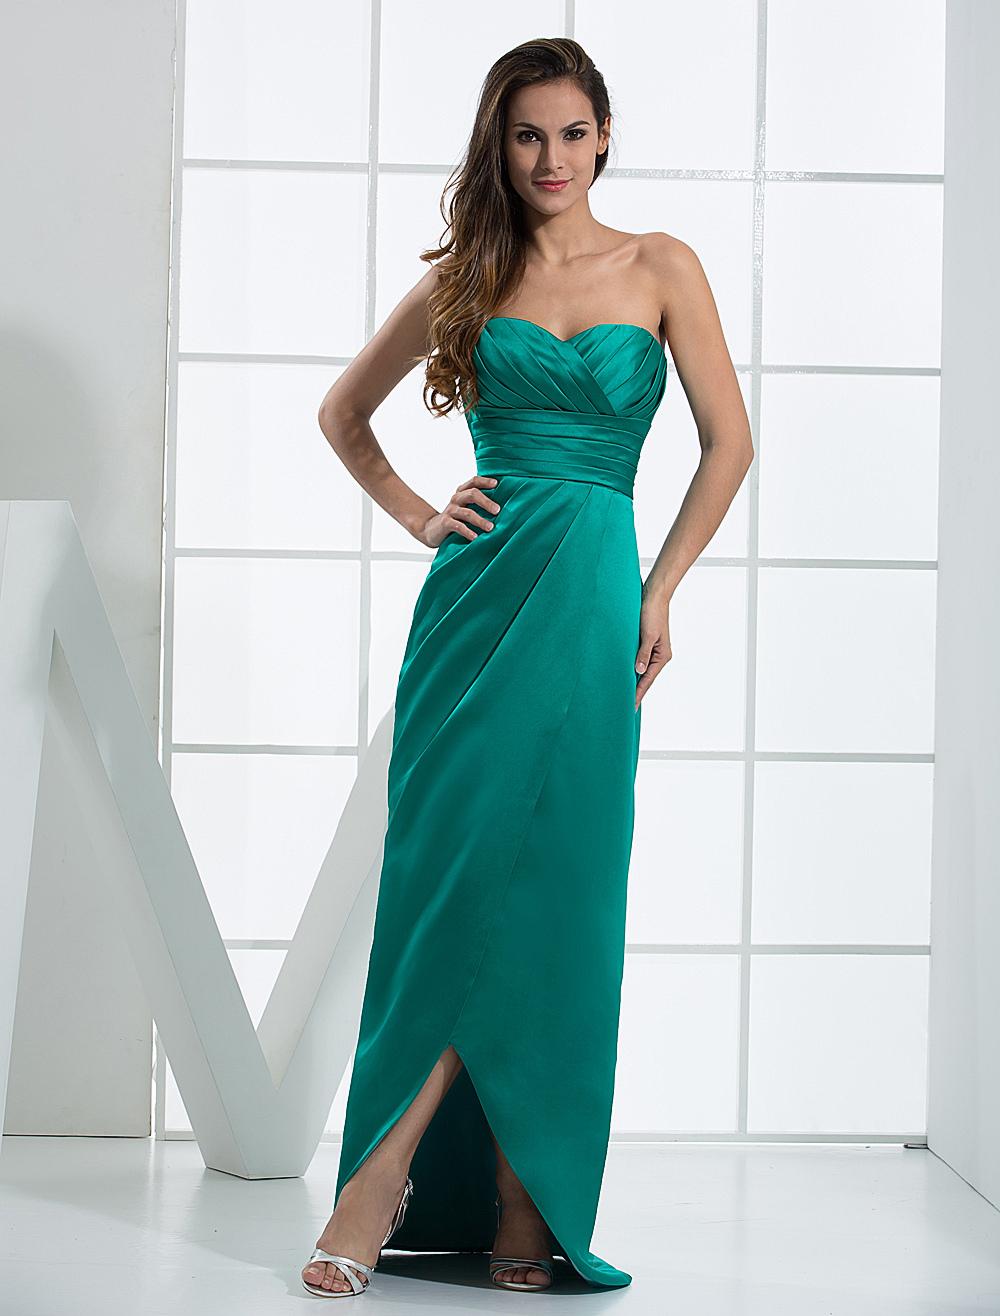 Sweetheart Evening Dress Blue Green Strapless Floor Length Satin Prom Dress (Wedding Cheap Party Dress) photo